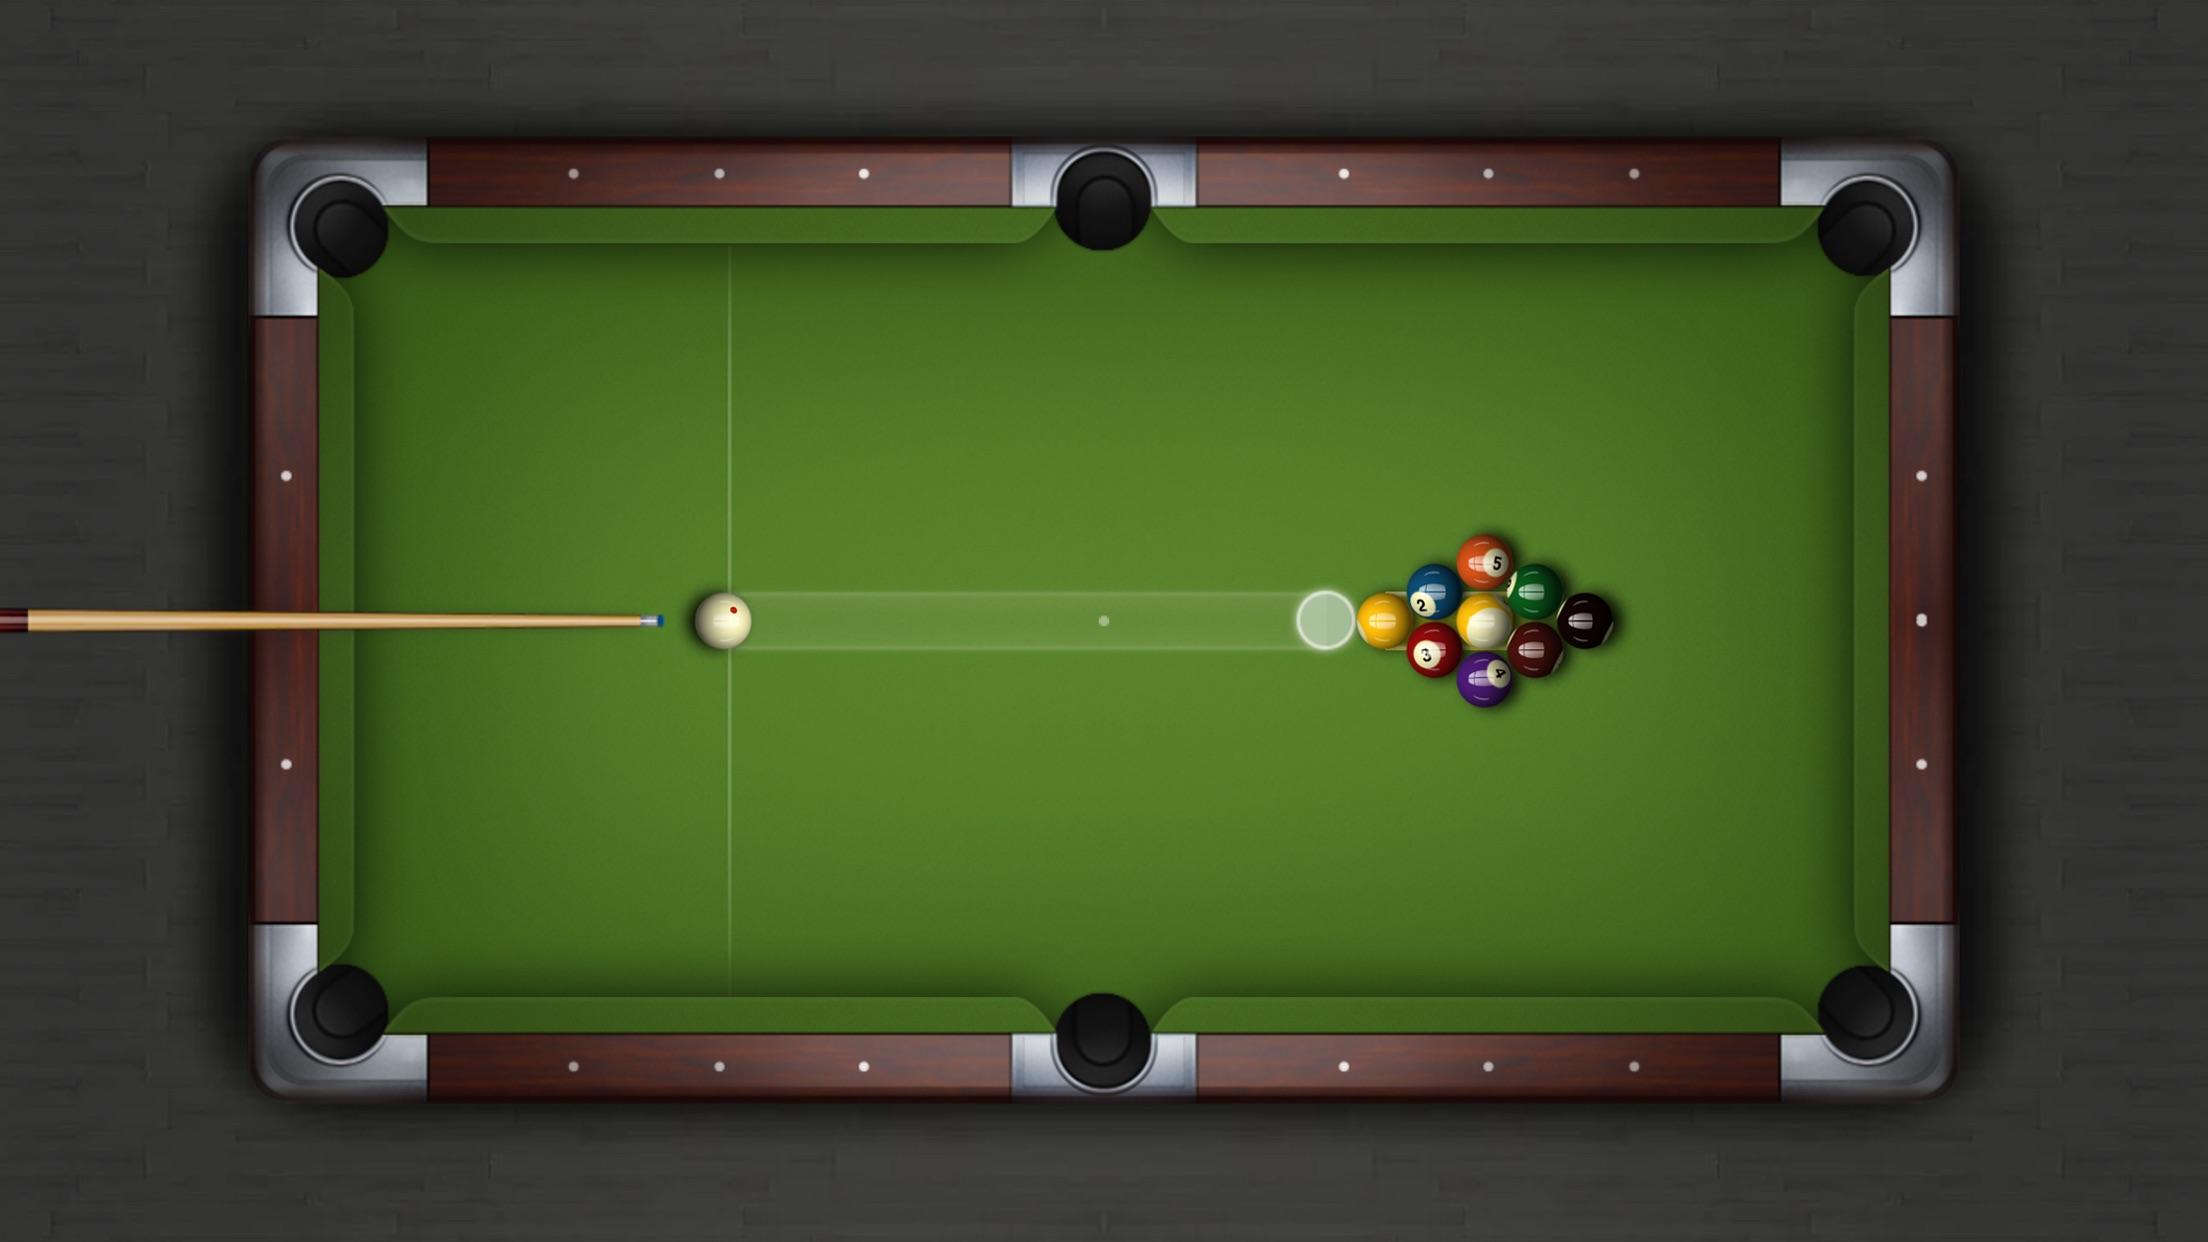 Pooking - Billiards City Screenshot